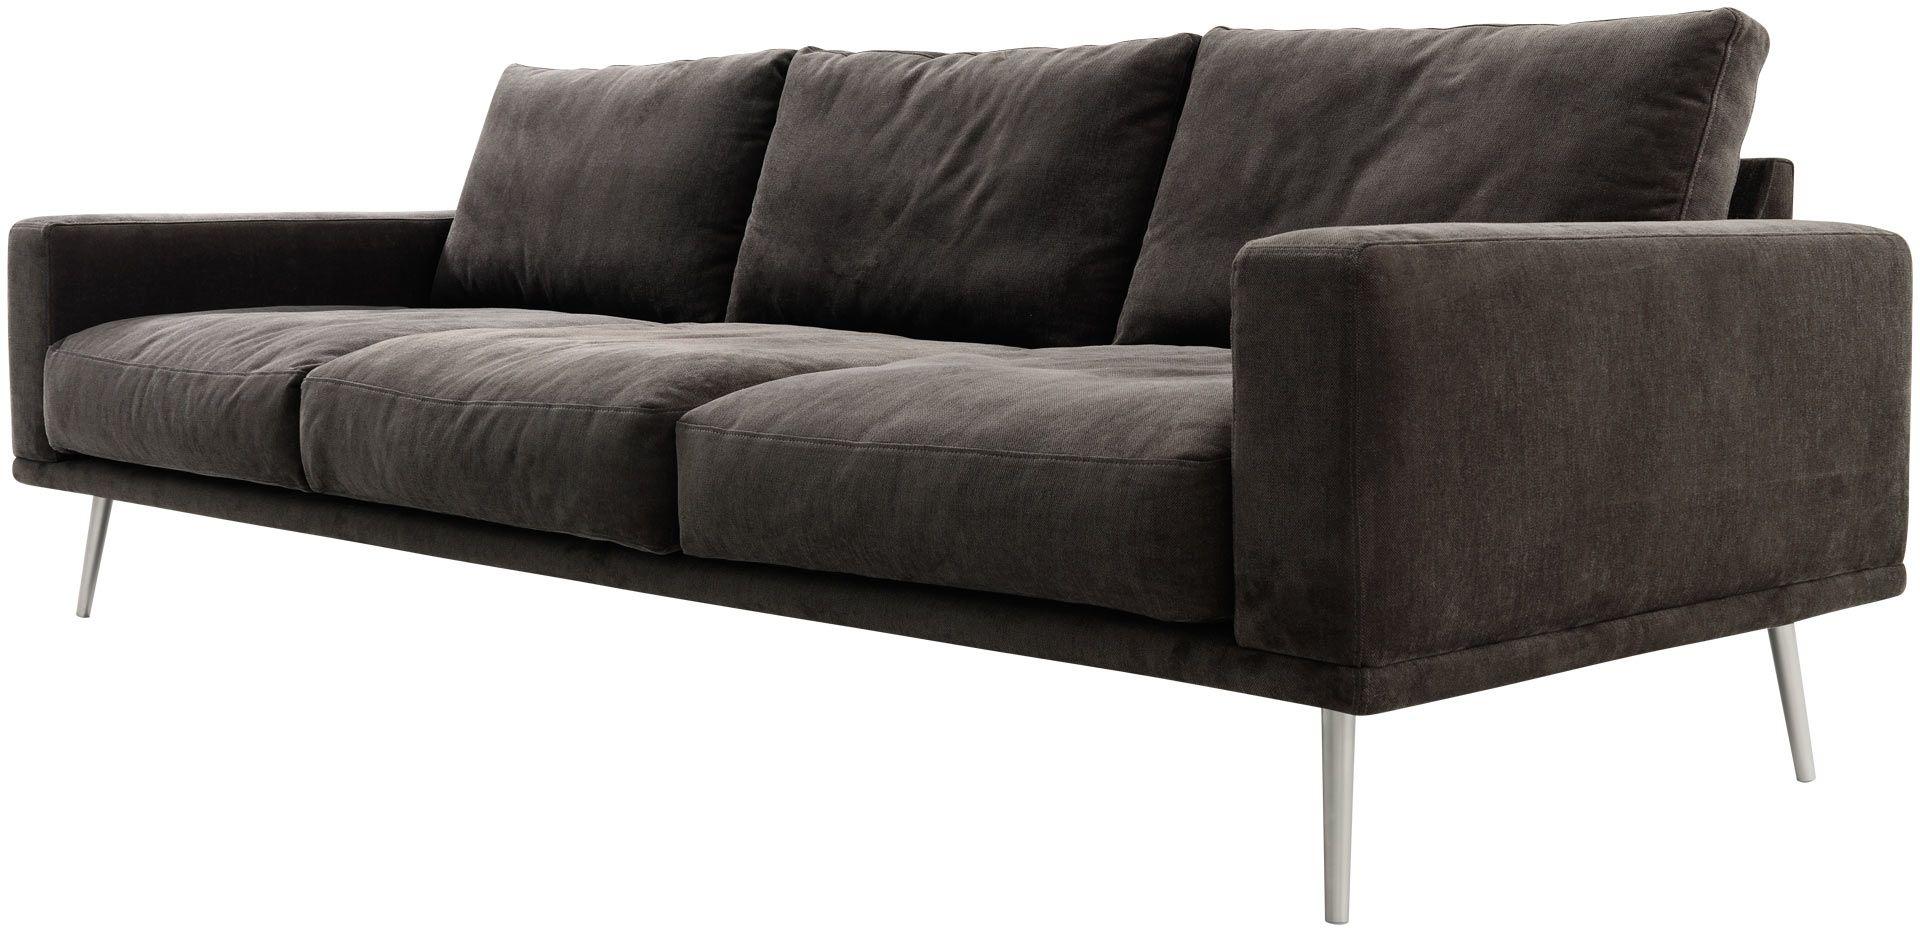 Boconcept Carlton Ca 2 000 Configurable Boconcept Sofa Sofa